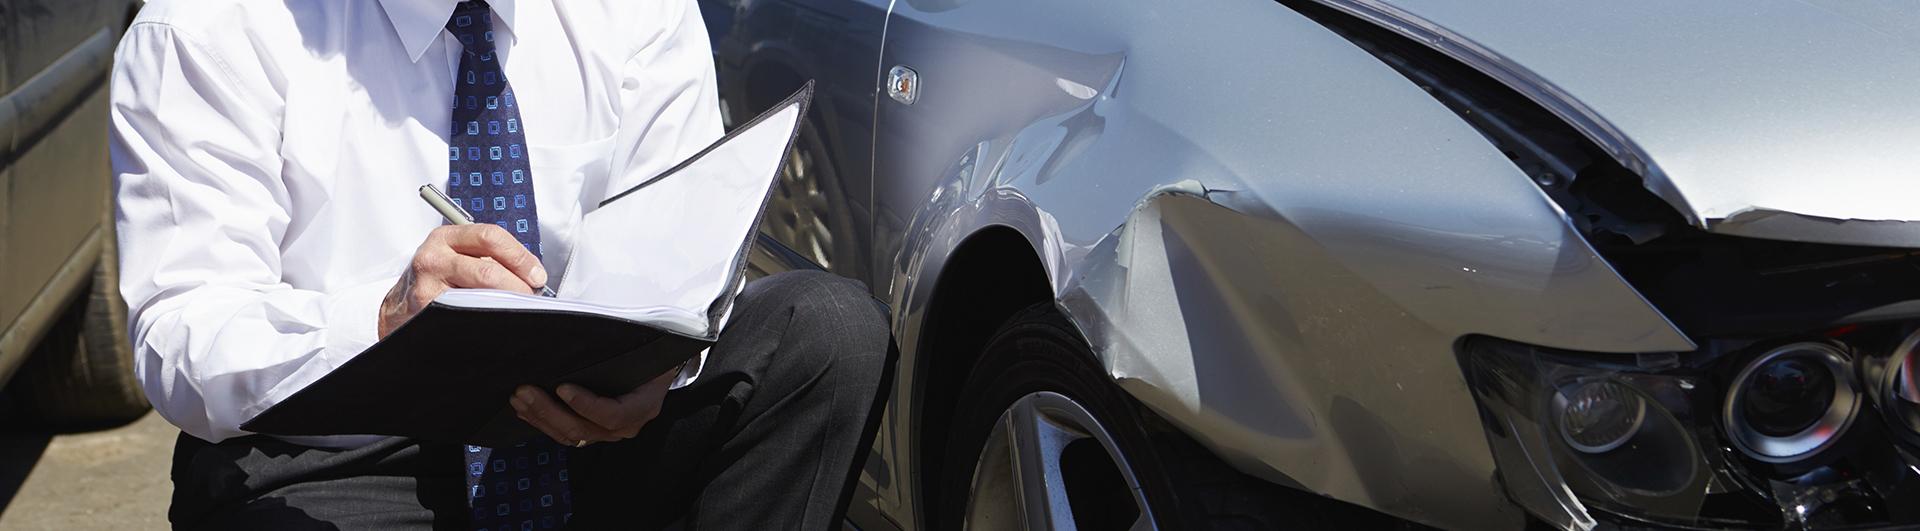 car-accidents-legal-representation.jpg